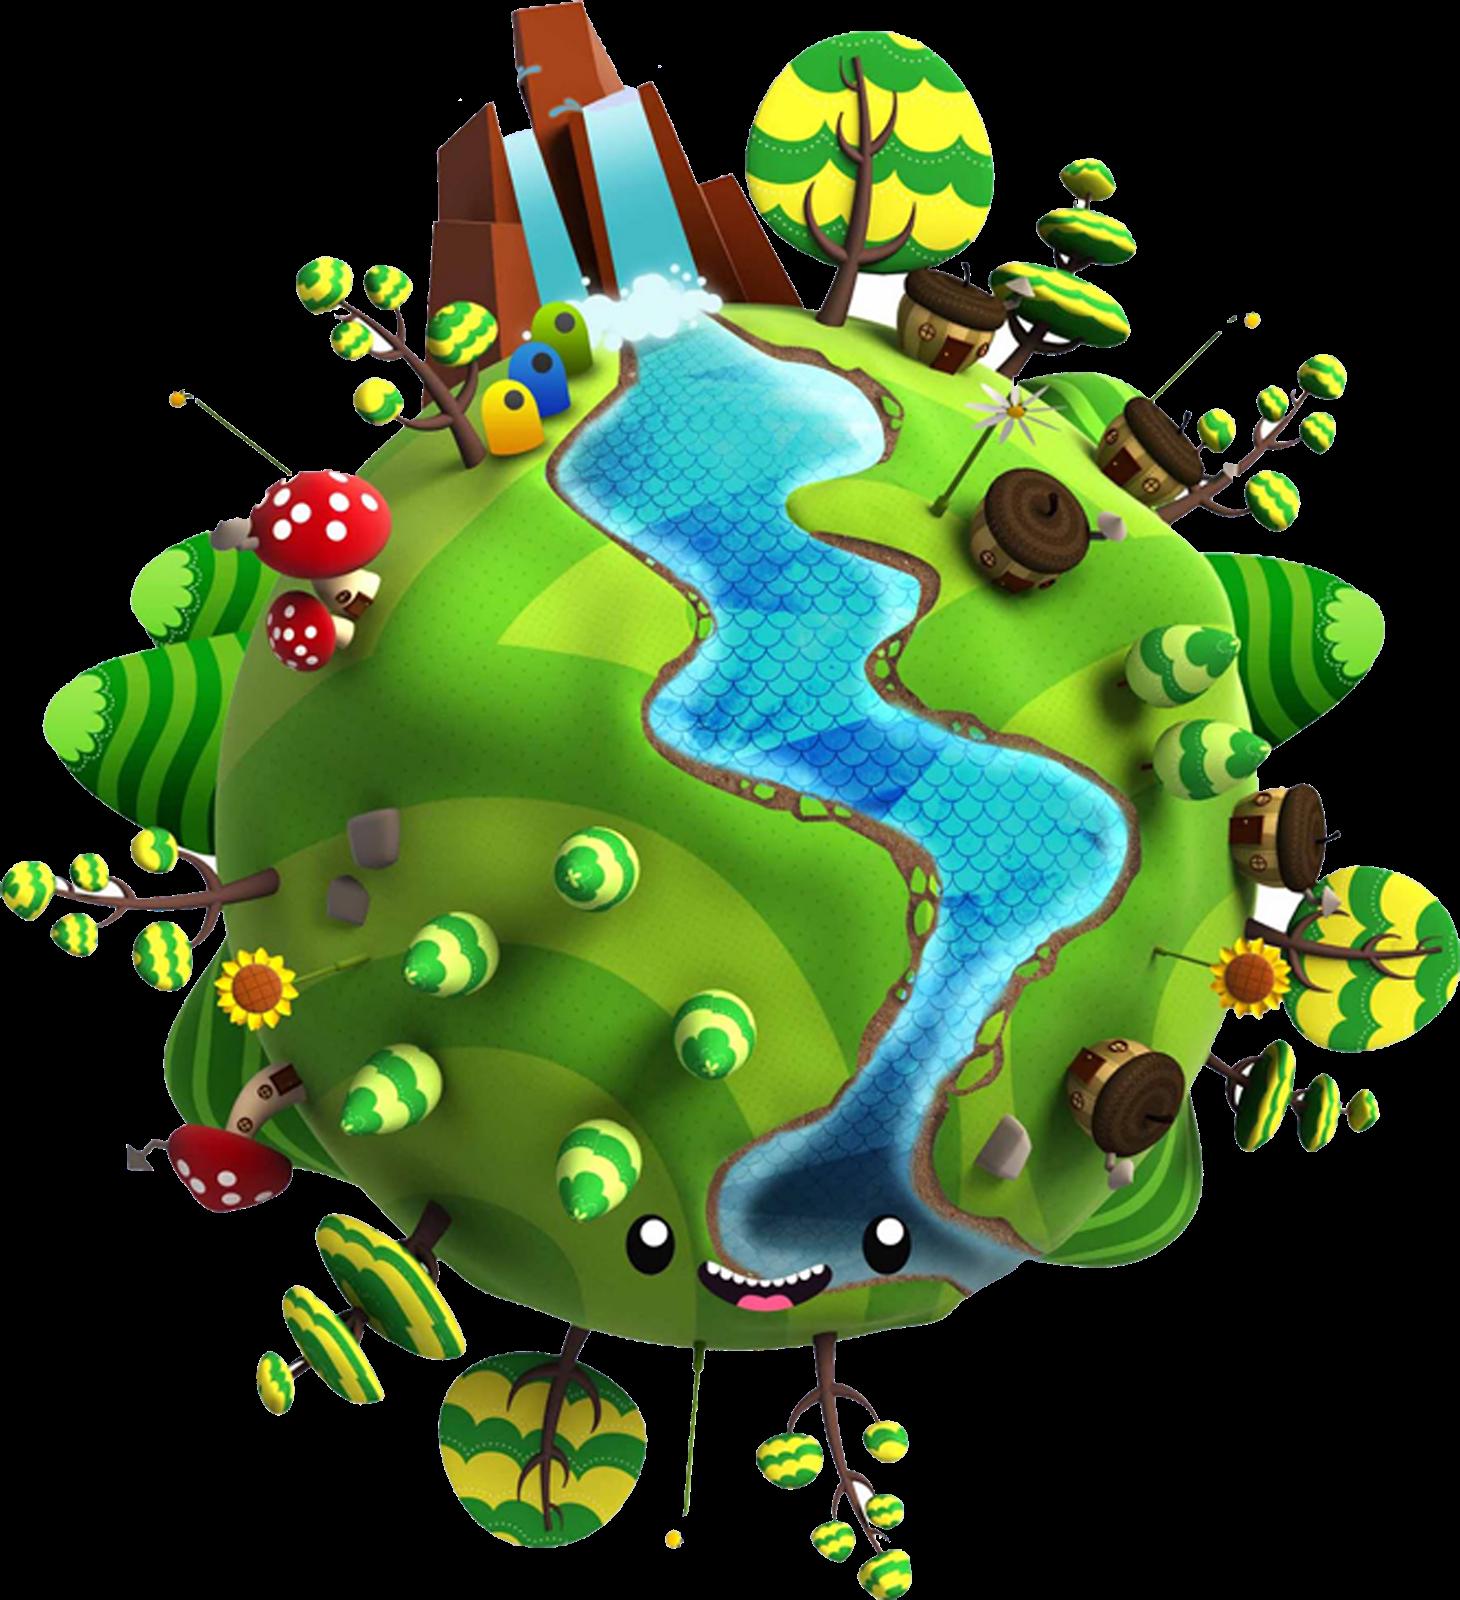 Organismo ecologia